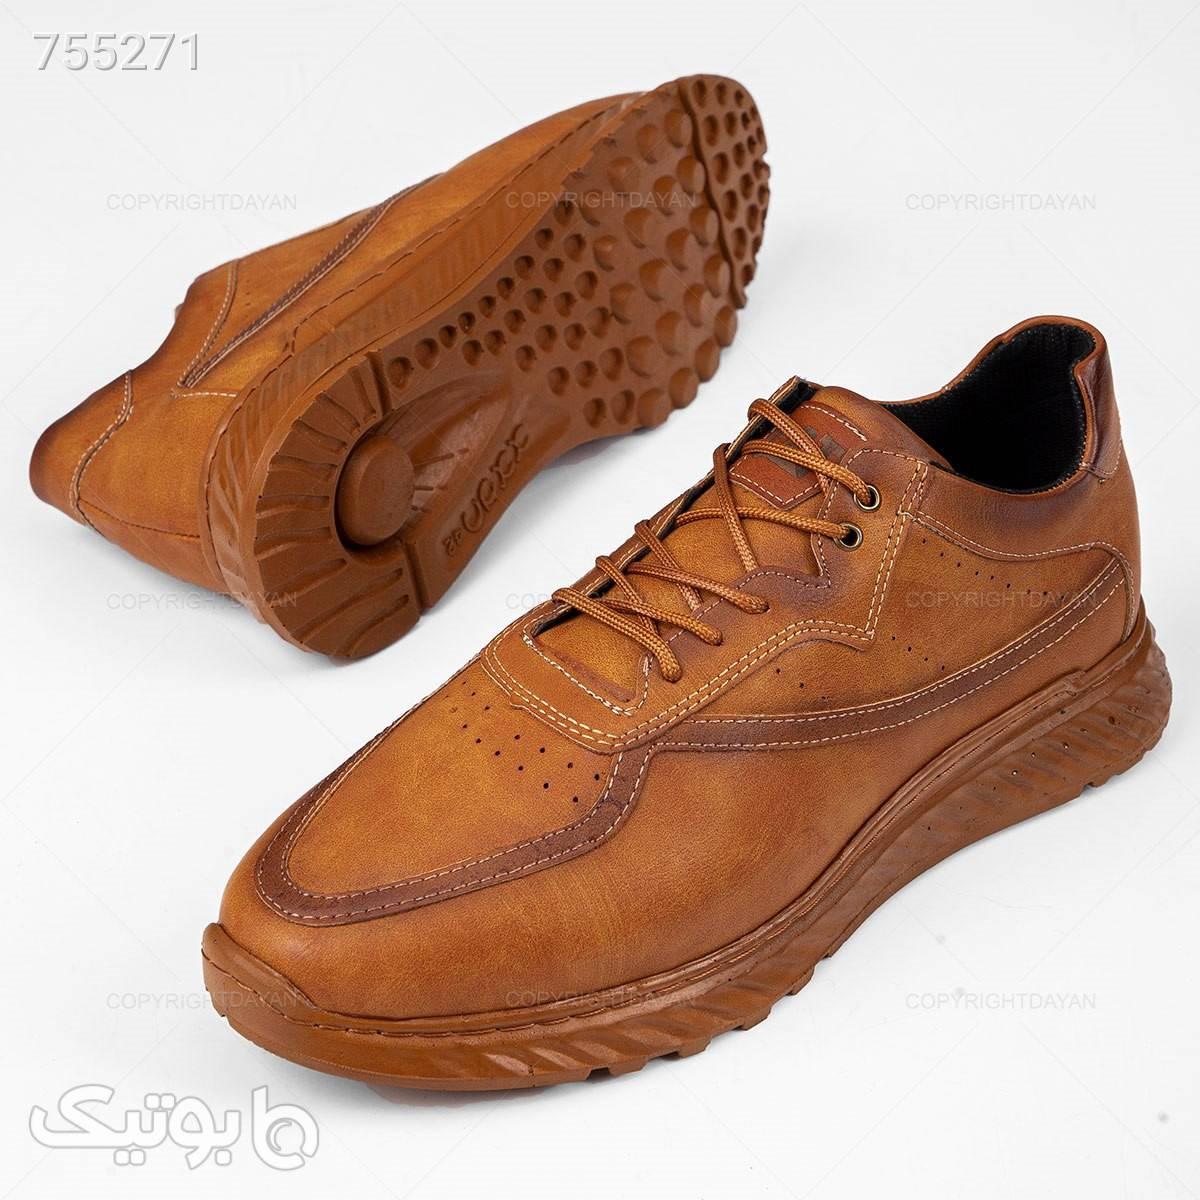 کفش مردانه Cat مدل 18945 قهوه ای كفش مردانه